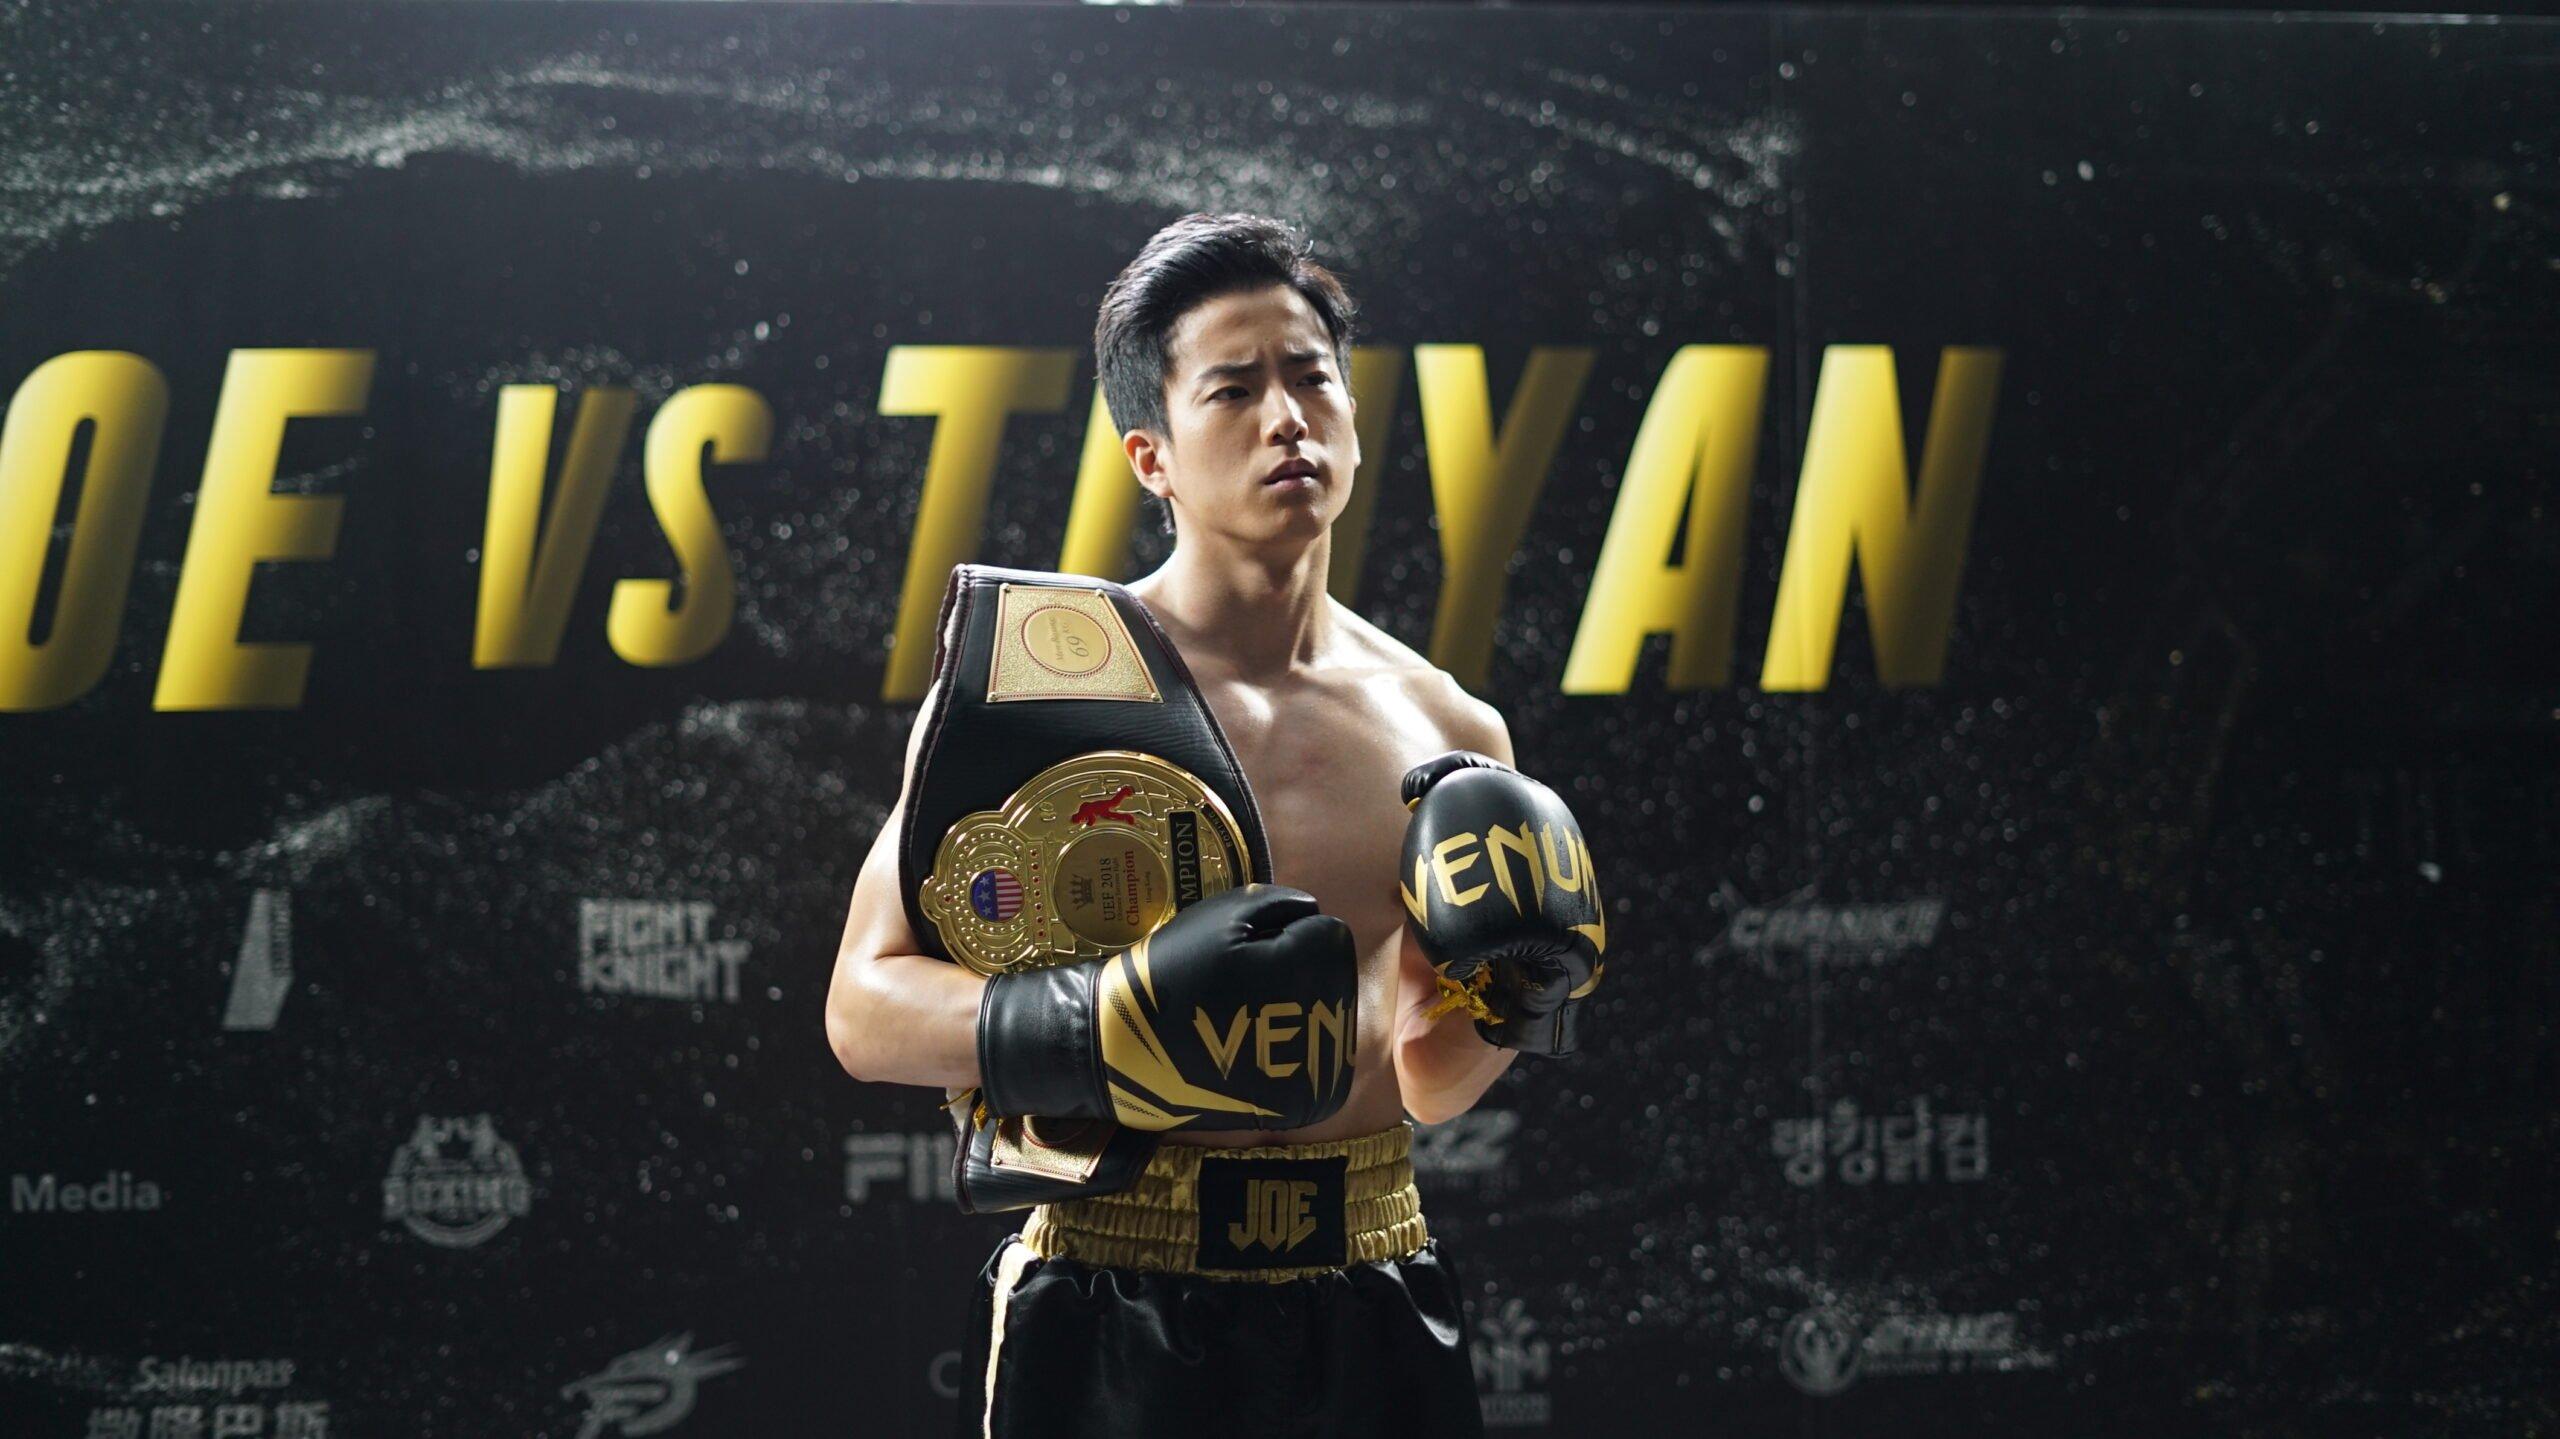 One Second Champion